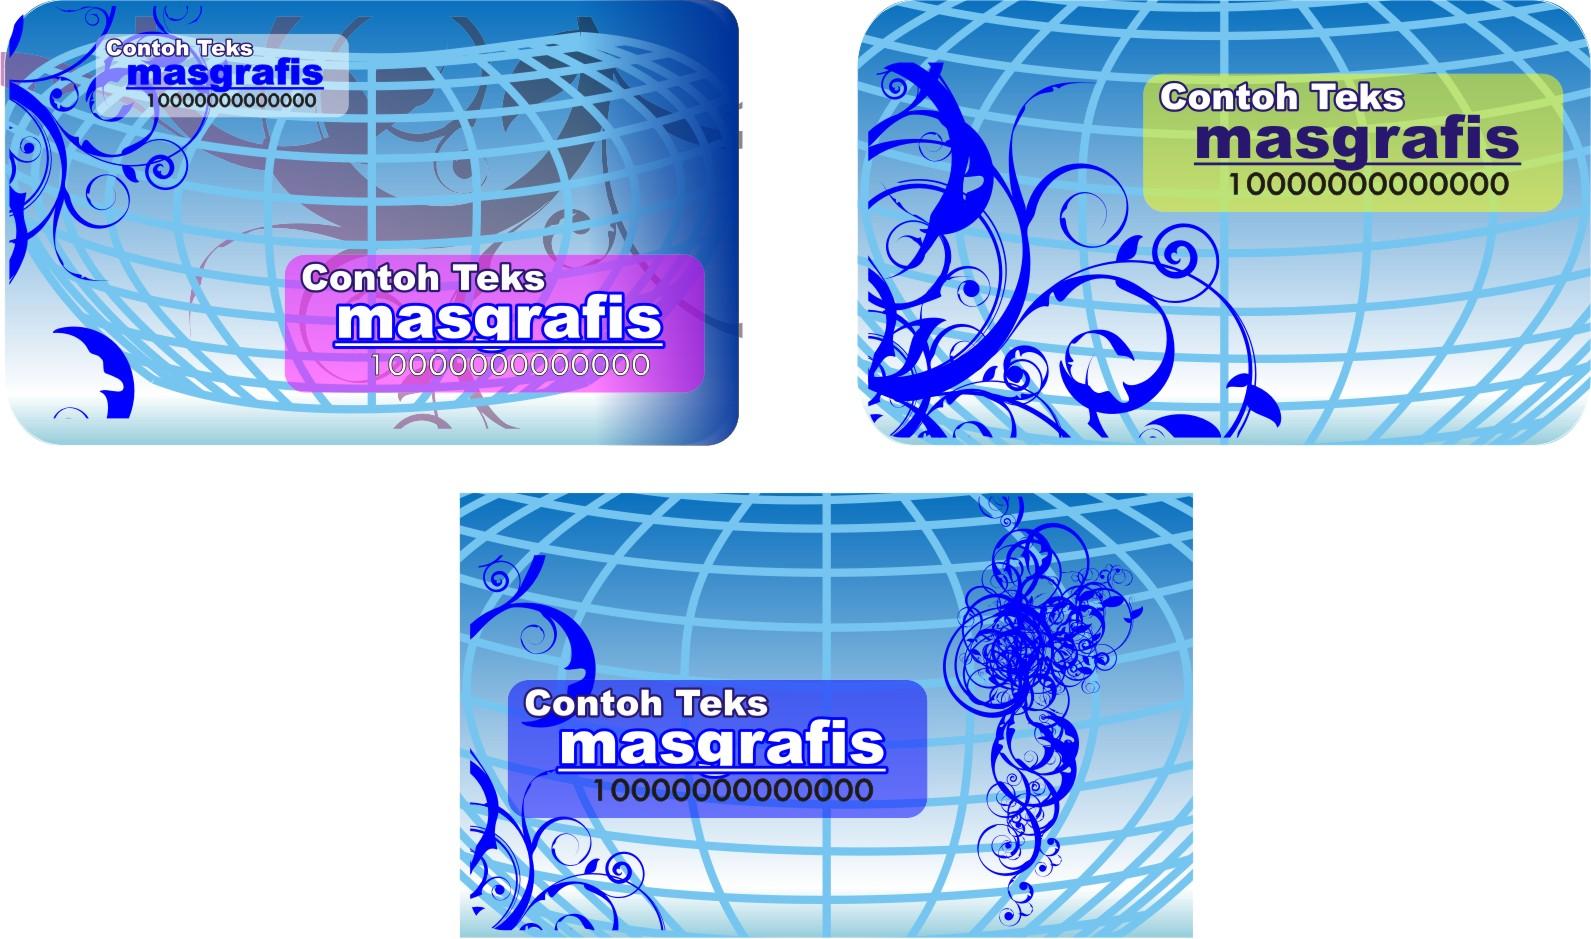 Free Download Contoh Desain Undangan Pernikahan 2012 Format Photoshop